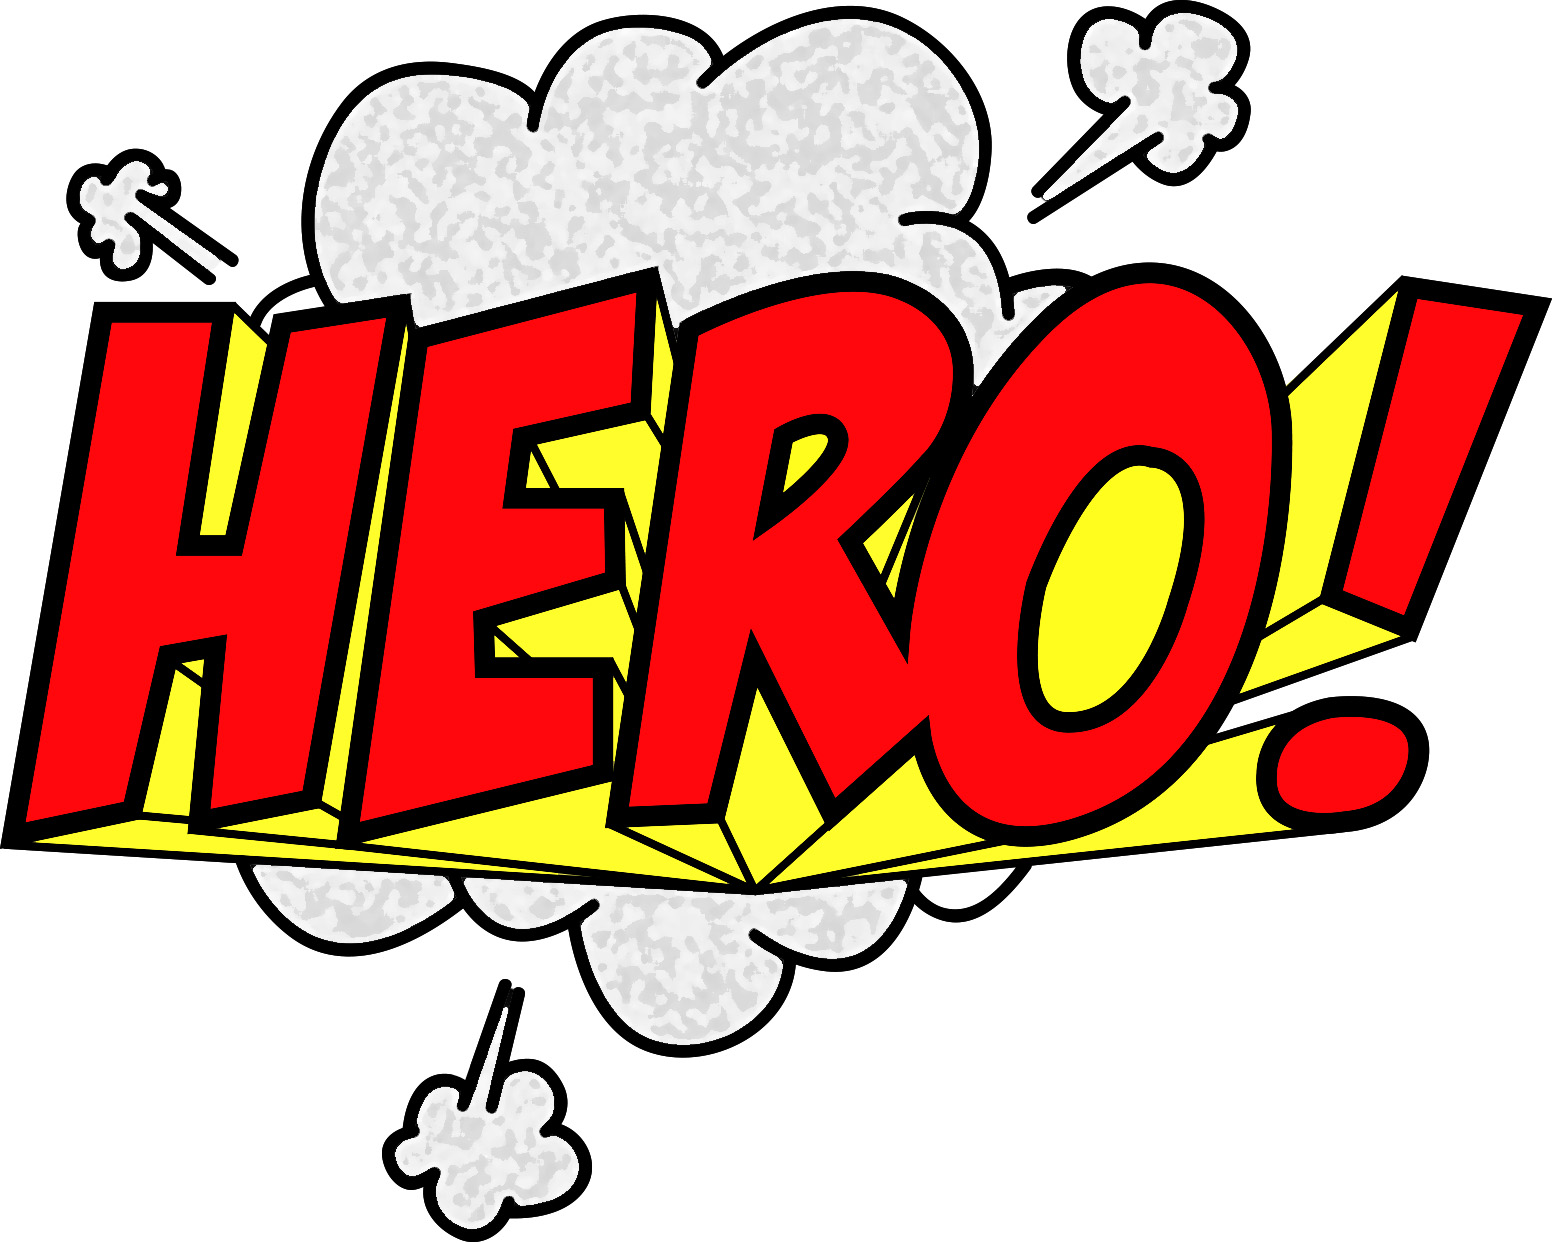 Superhero words clipart 5